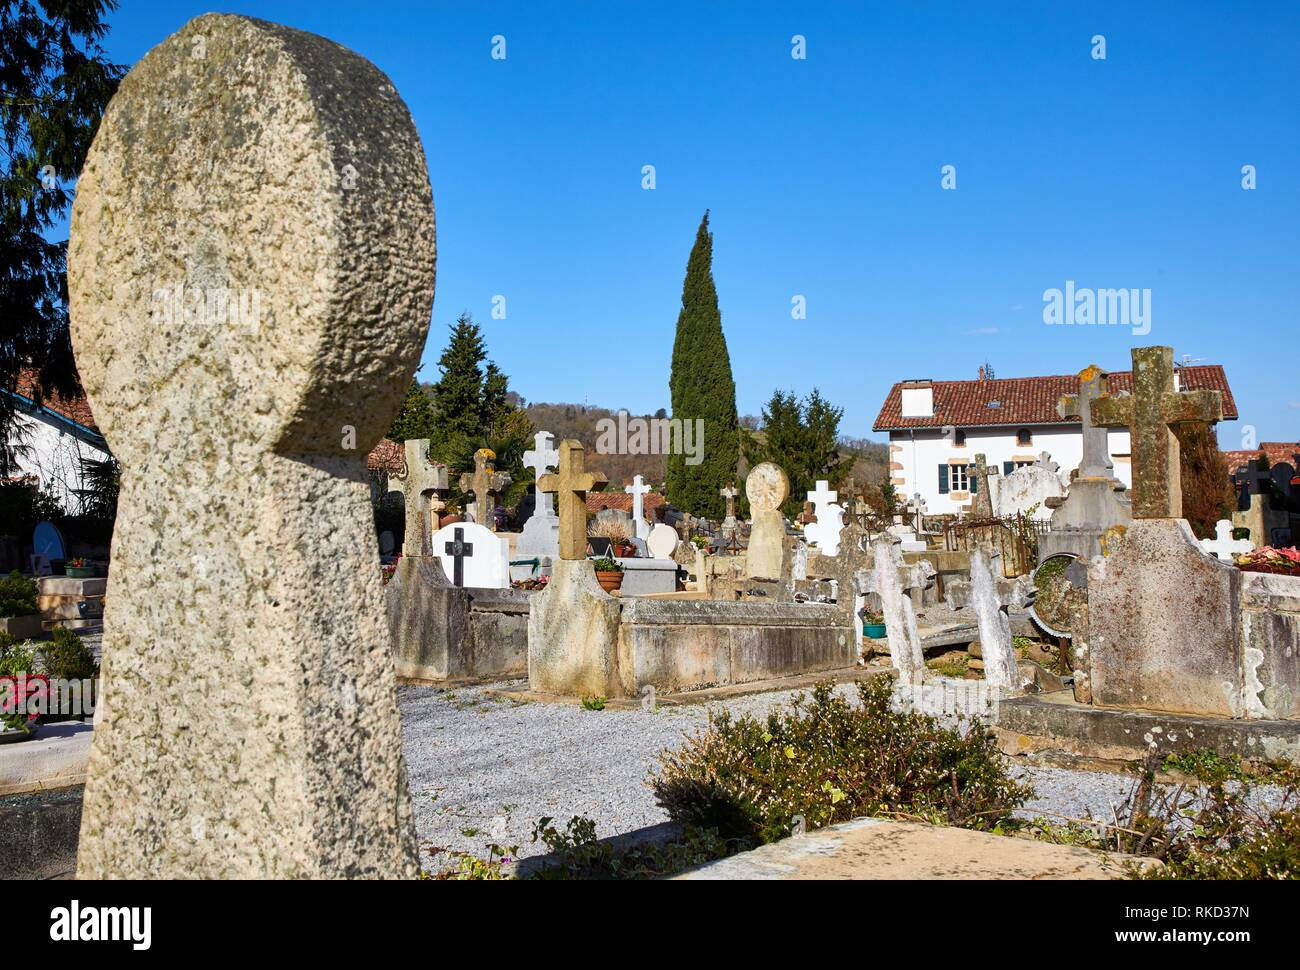 Discoidal steles Basque, Funeral steles, Cemetery, Sara, Pyrénées-Atlantiques department, Aquitaine region, France, Europe - Stock Image